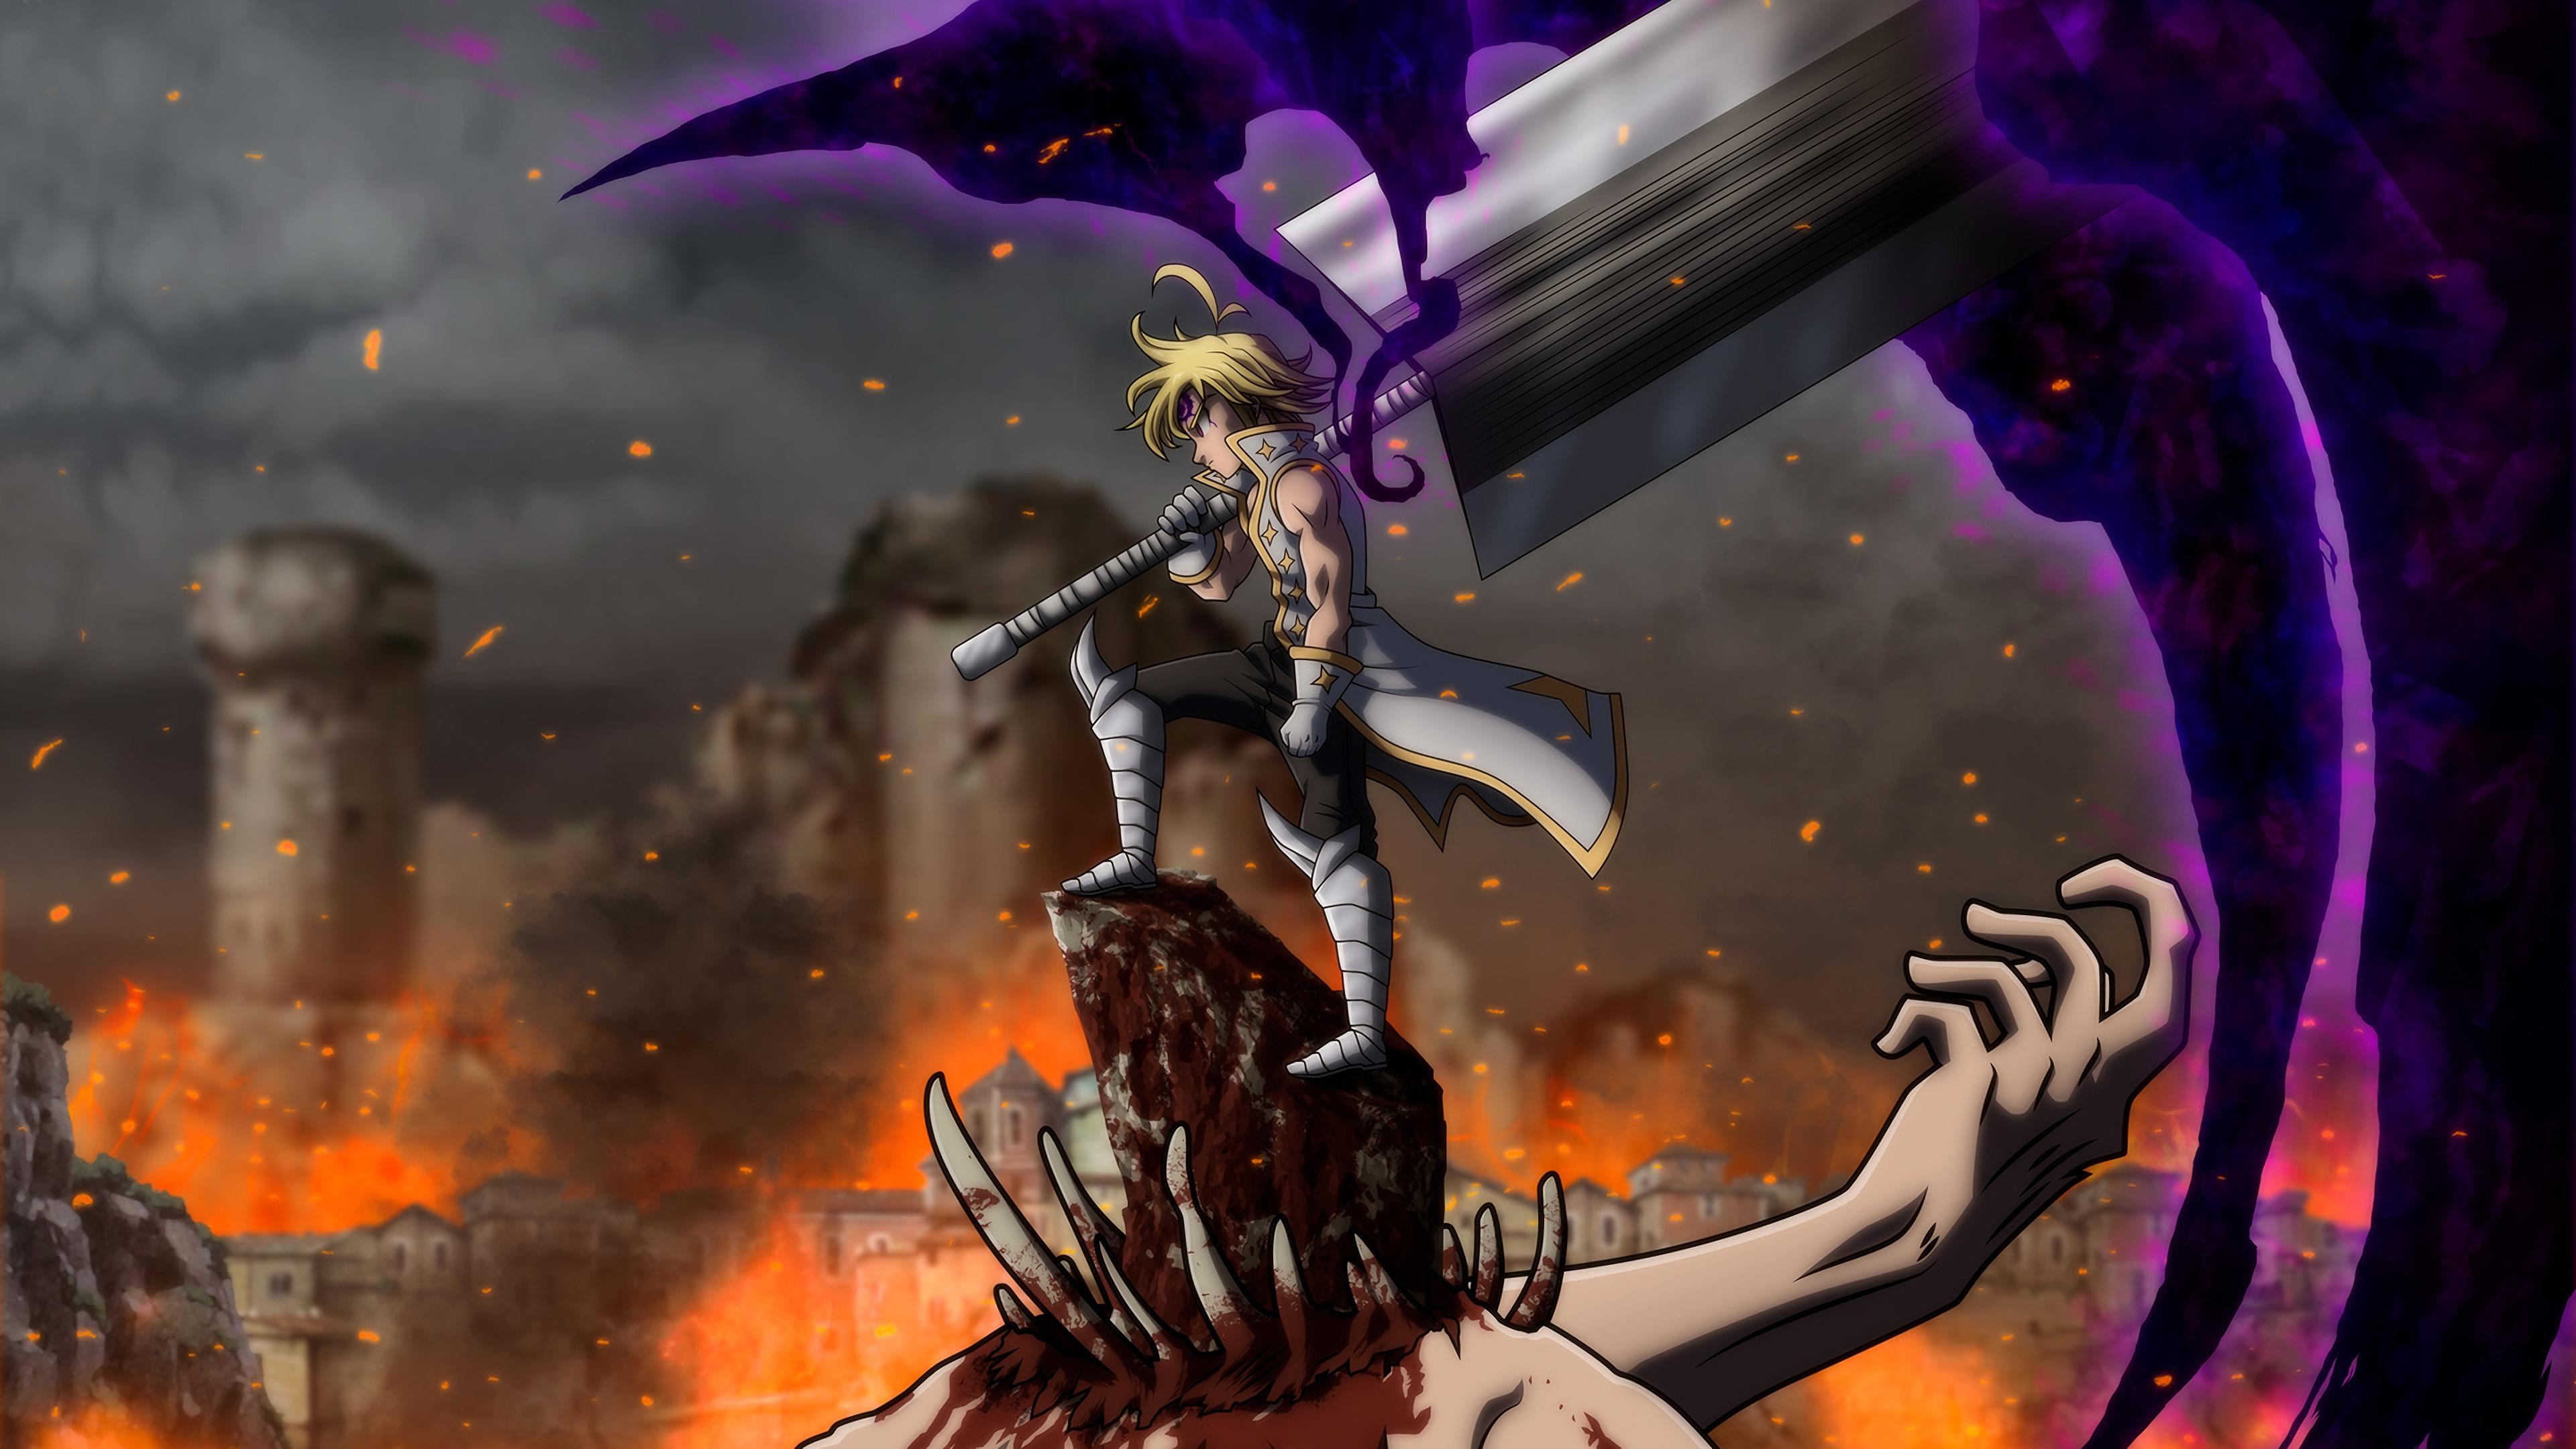 Medliodas Demon King 4k Ultra Hd Wallpaper Background